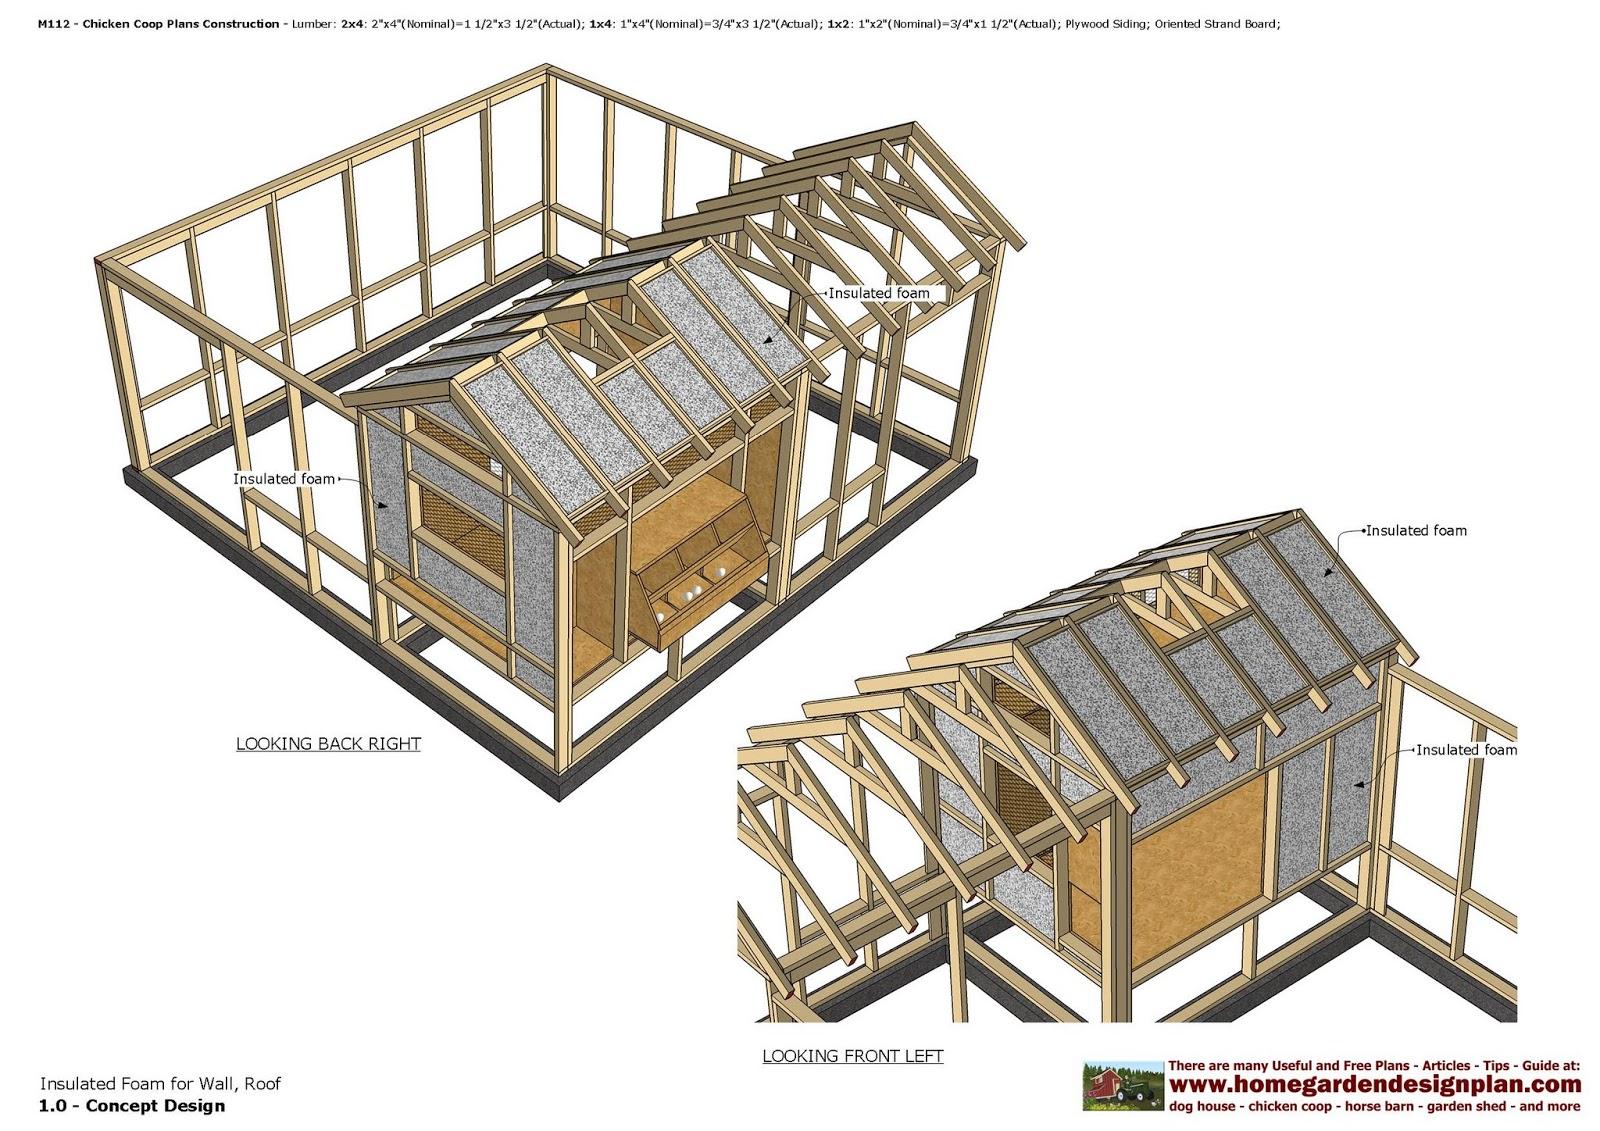 Home garden plans m112 chicken coop plans construction for U build plans